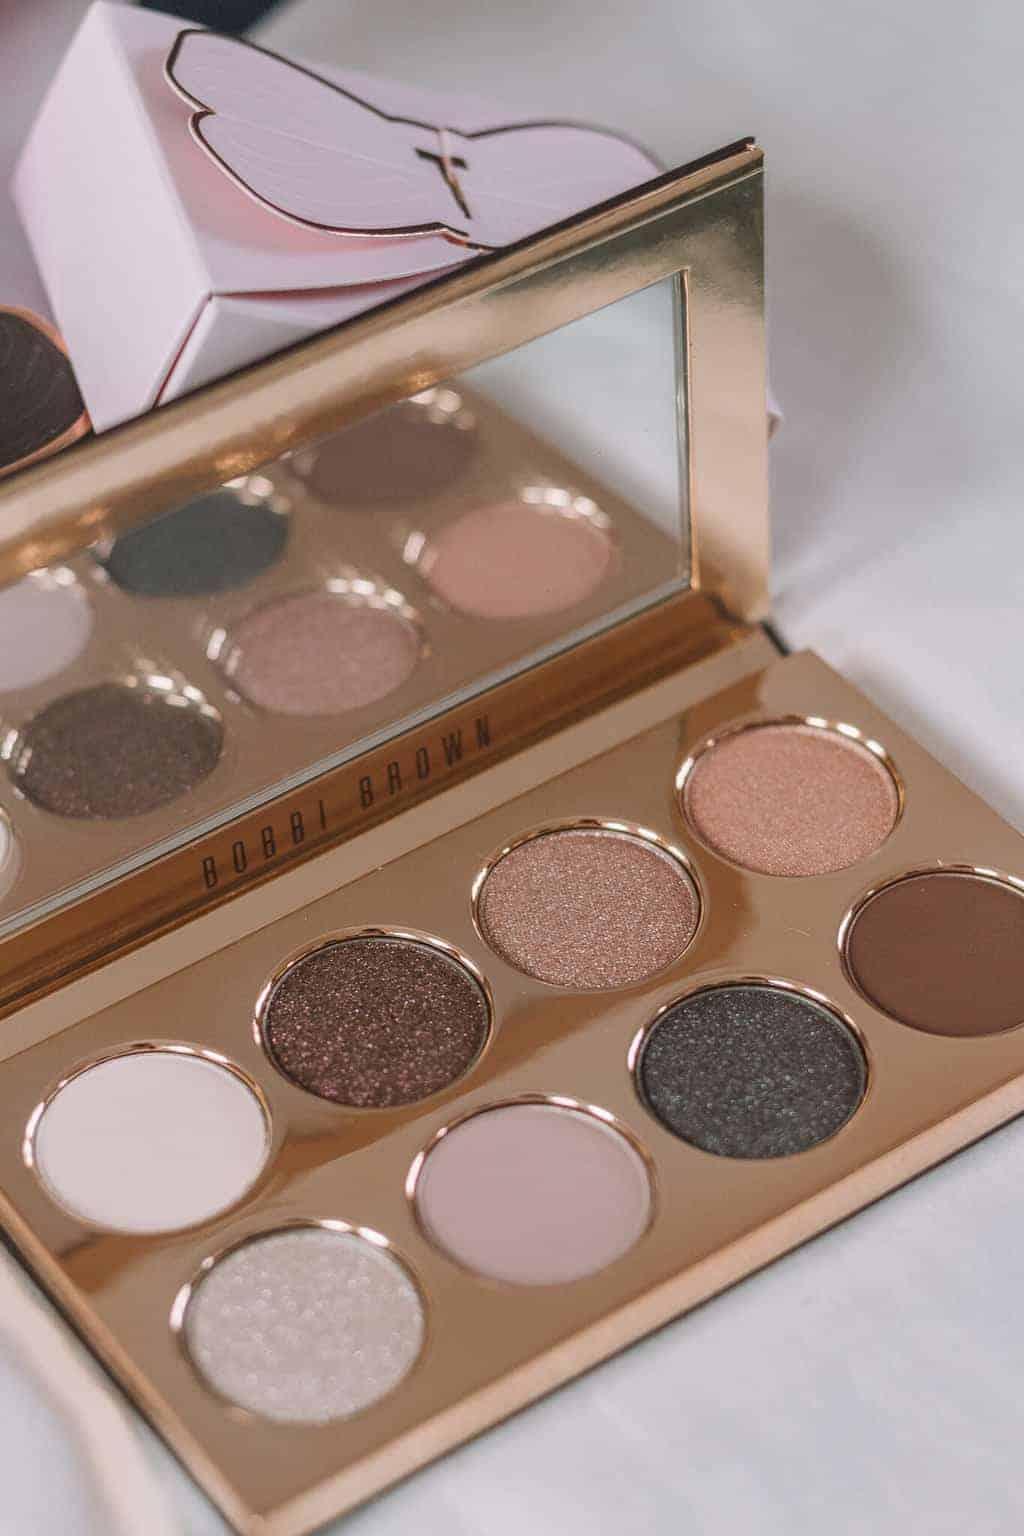 Bobbi Brown eye Shadow - Christmas Gift Guide 2018: Brilliant Christmas Gift Ideas For Her #whatshotblog